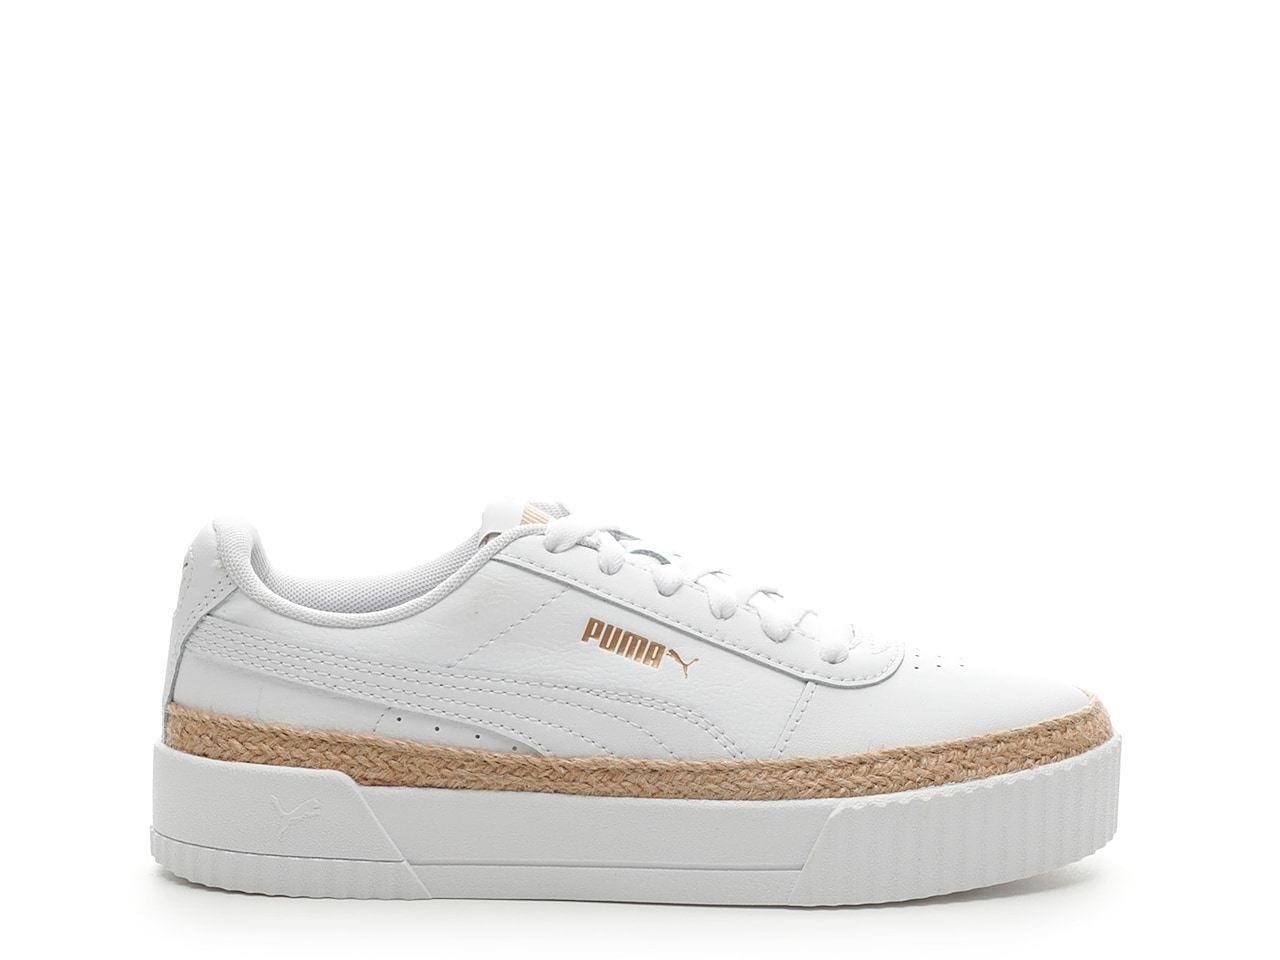 Puma Carina Lift Espadrille Sneaker - Women's